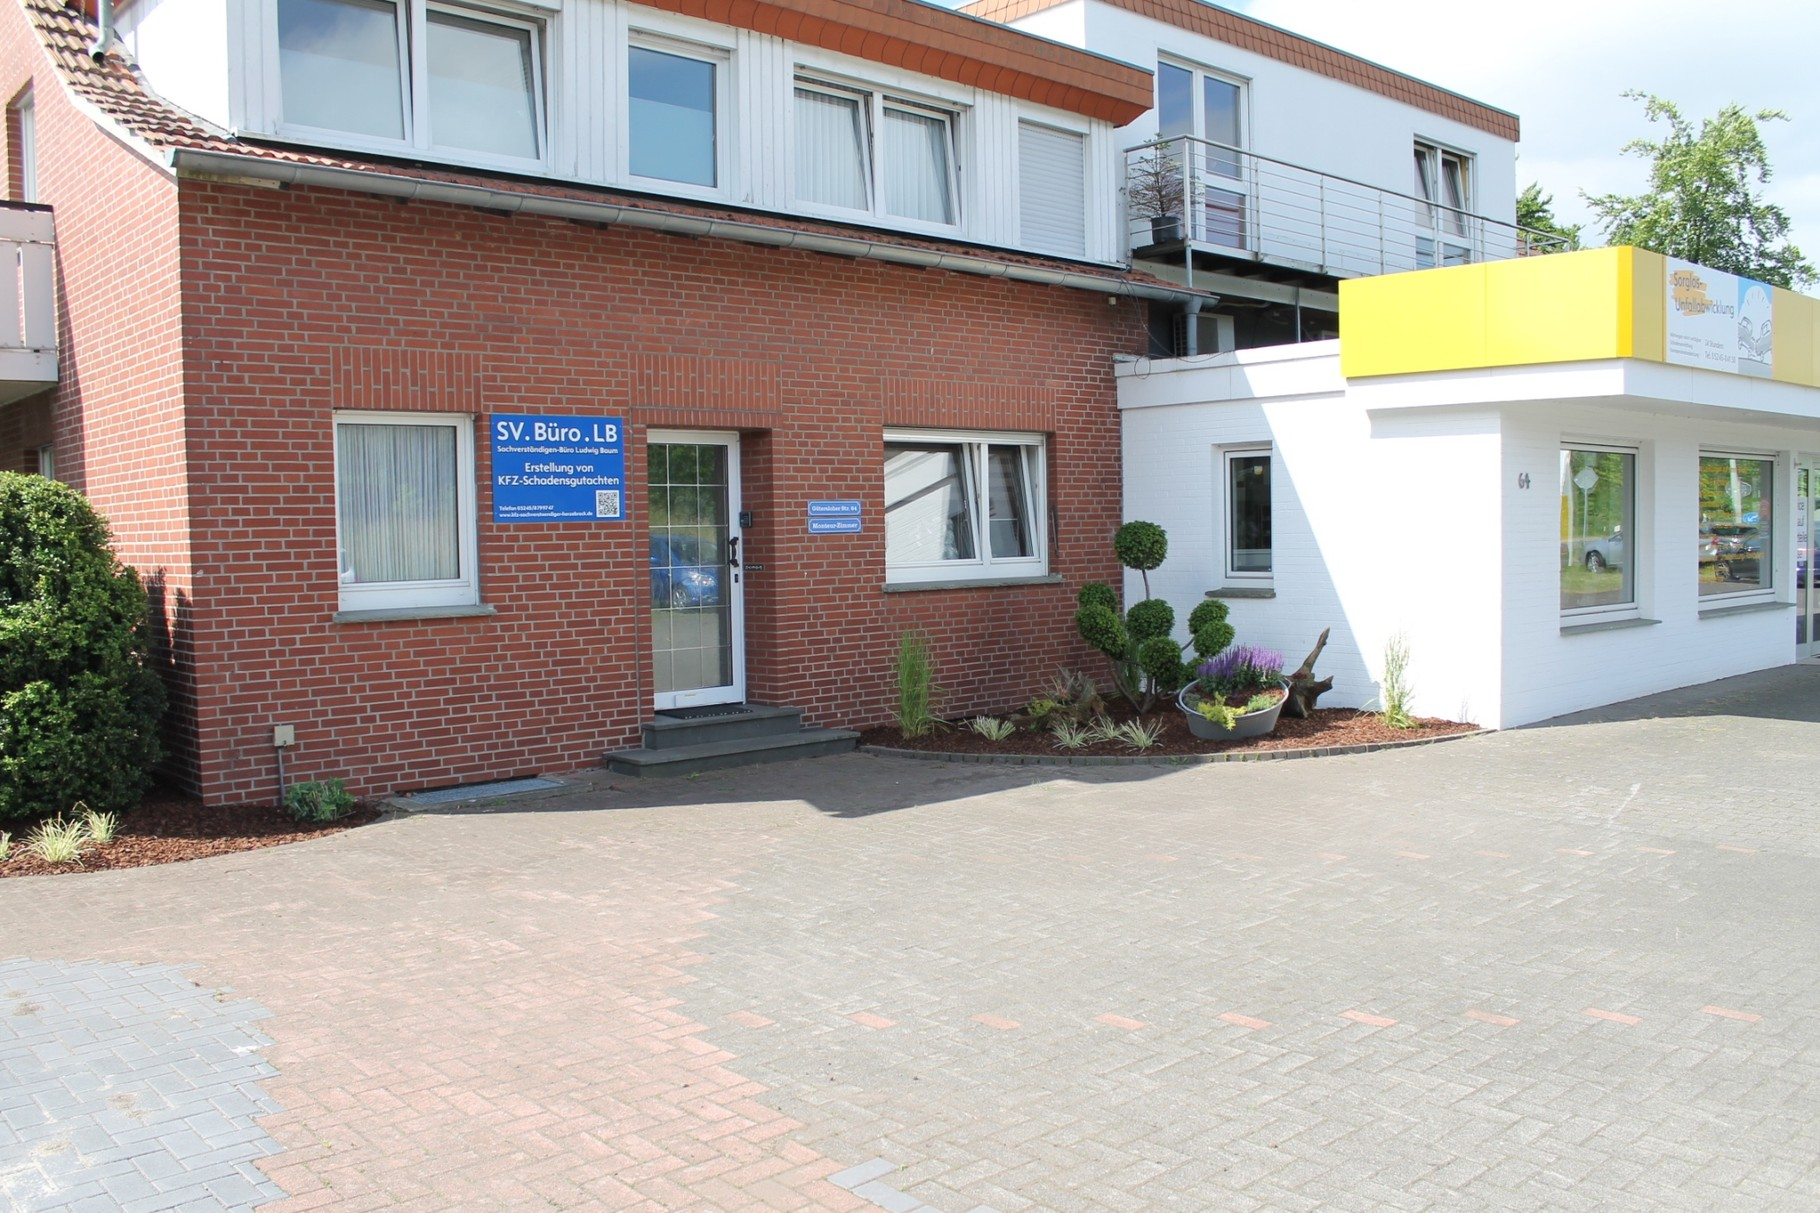 Eingang neben Autohaus Baum / SV.Büro.LB